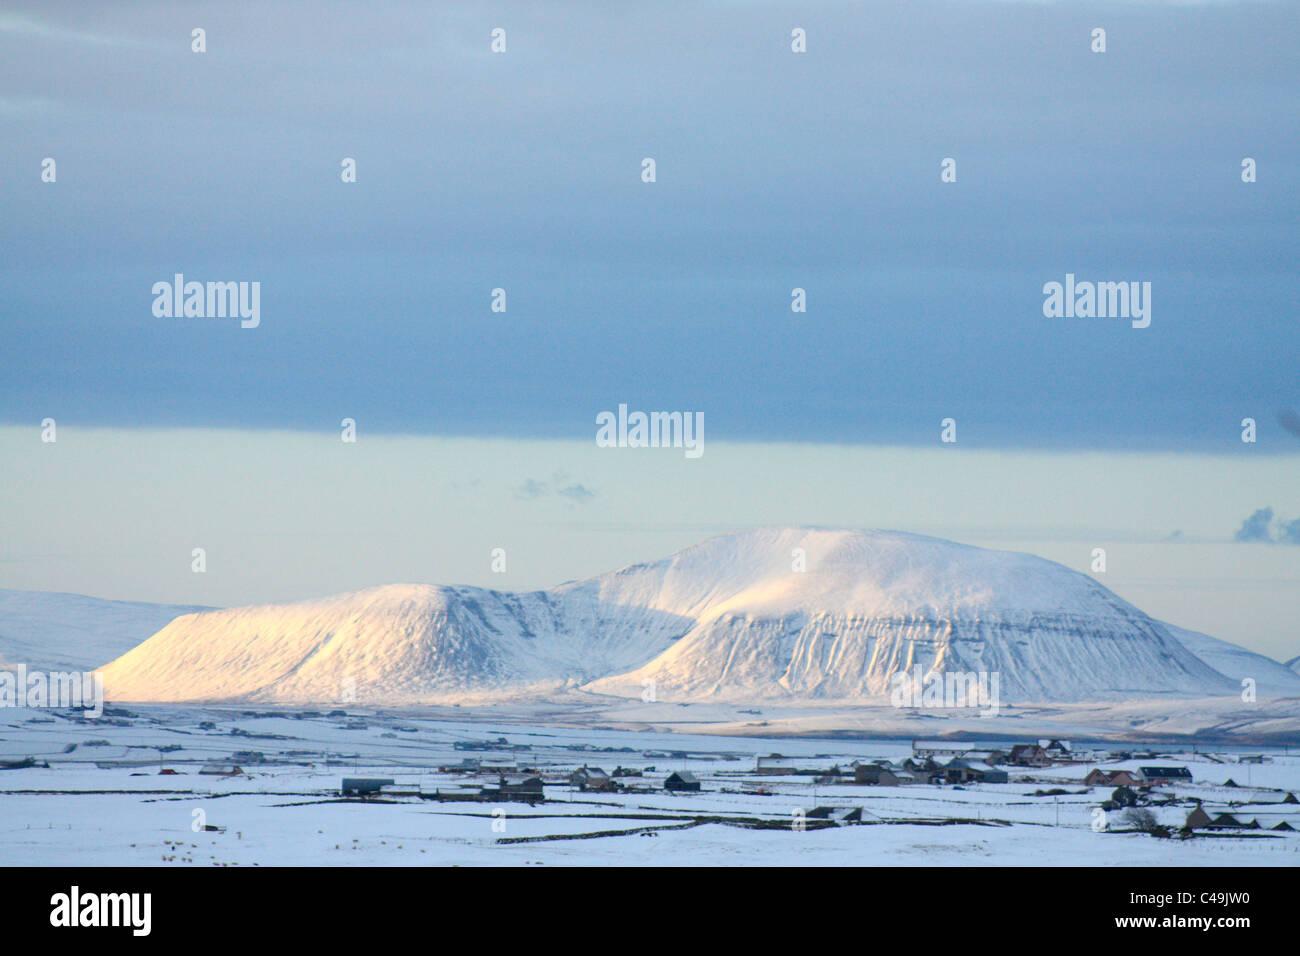 Ward Hill in inverno, Orkney Isles Immagini Stock